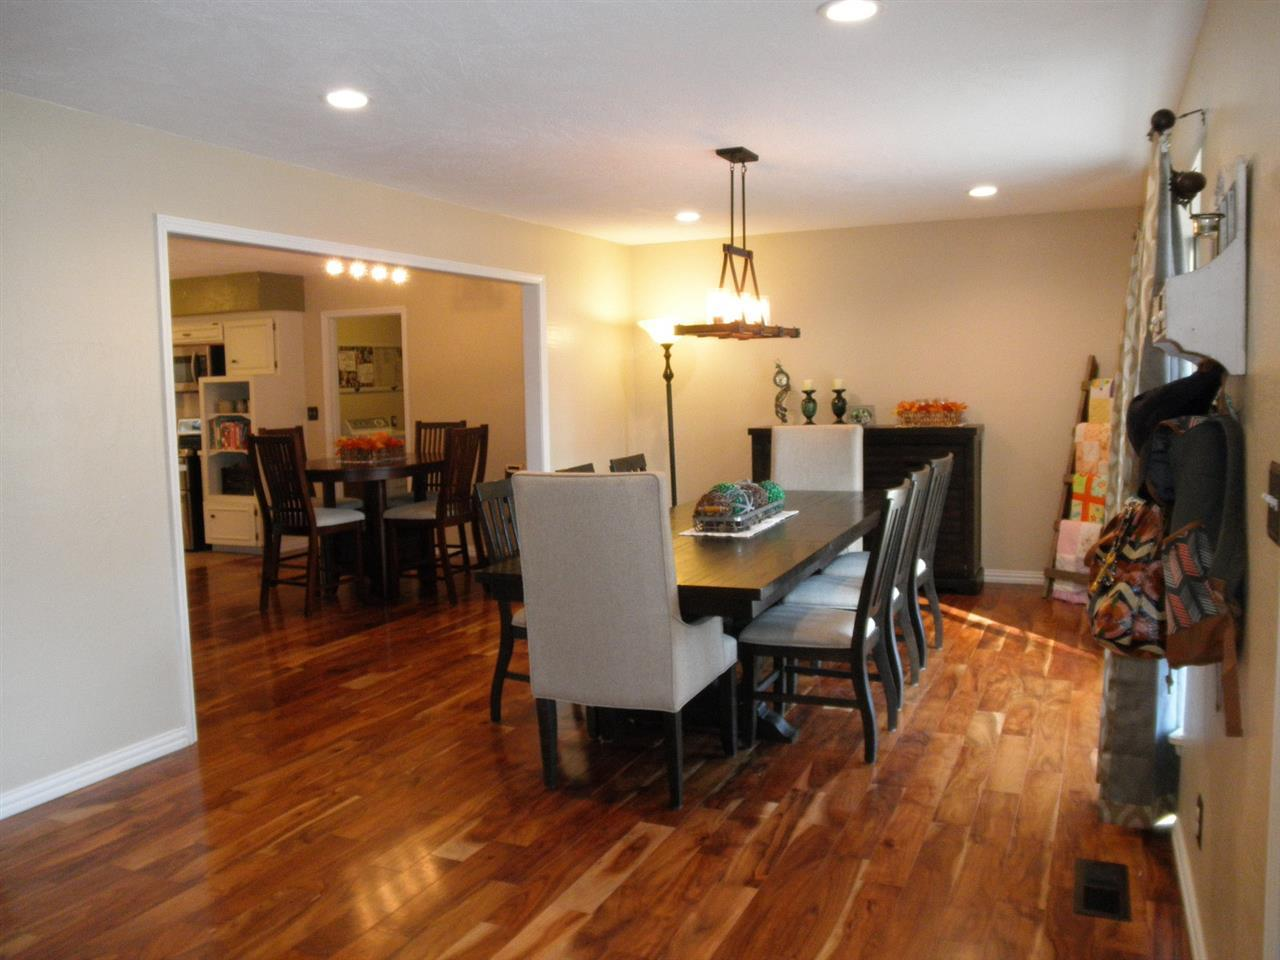 Sold Intraoffice W/MLS | 1504 Trio Lane  Ponca City, OK 74604 7